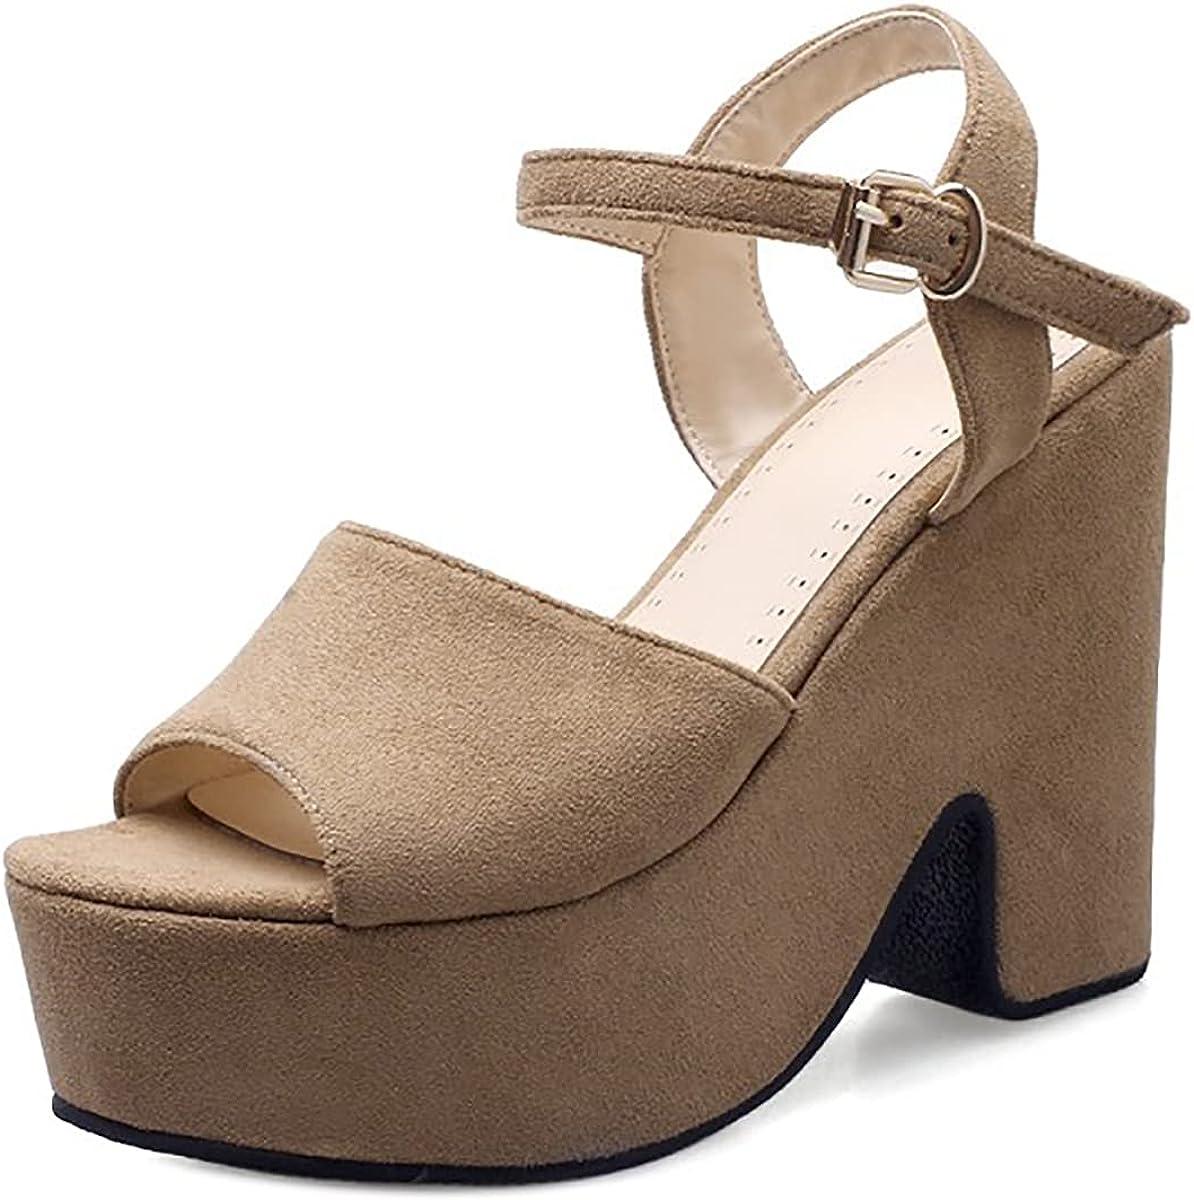 Popular brand NueiVeiuo Women Platform Sandals Popular overseas Chunky Ankle Heels Strap Shoes